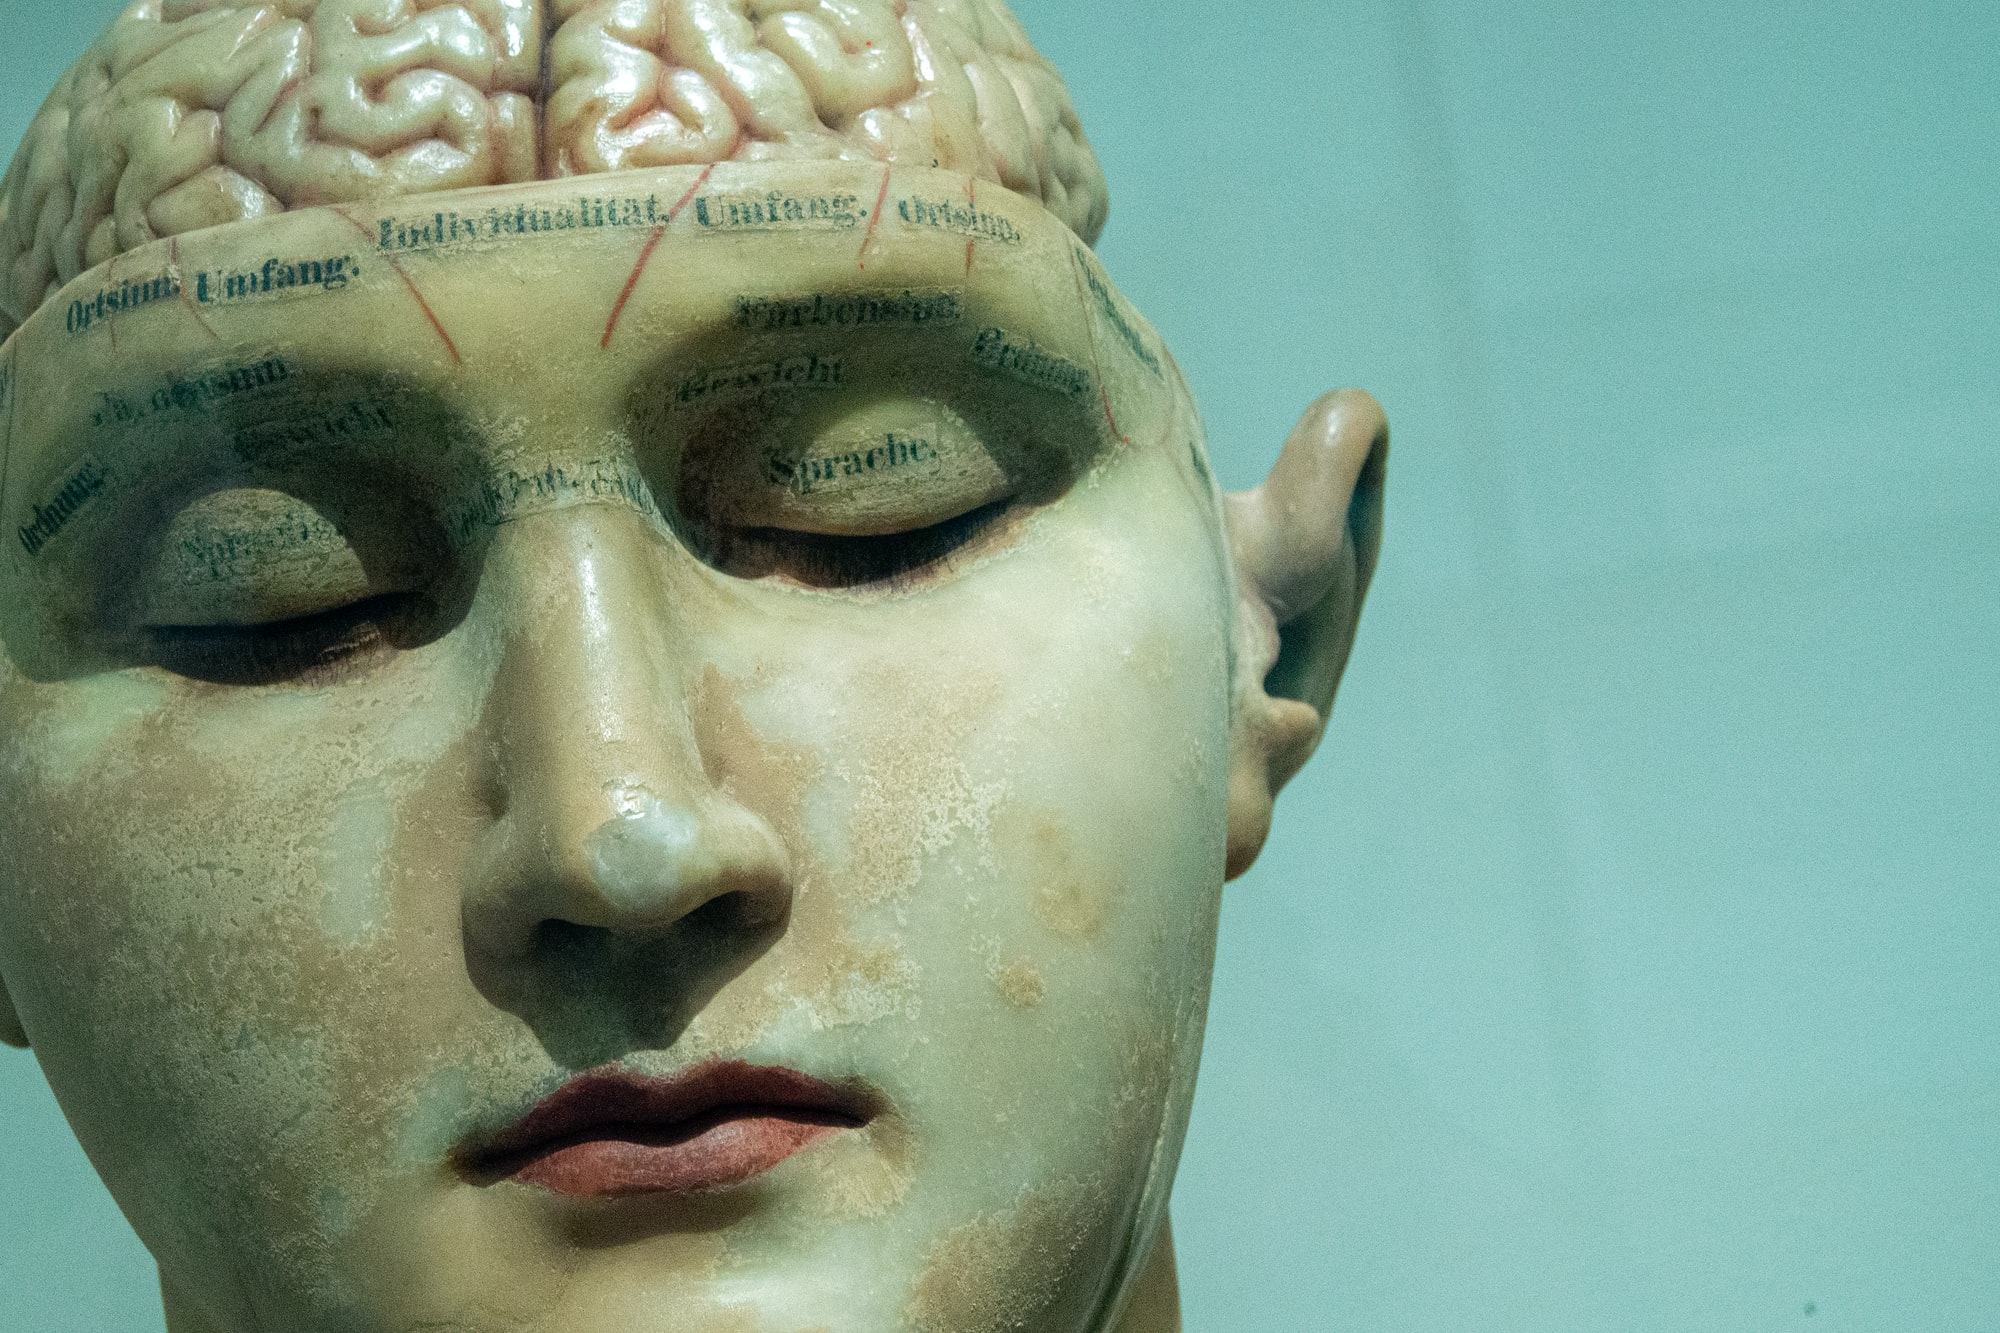 Brain model early 20th century.